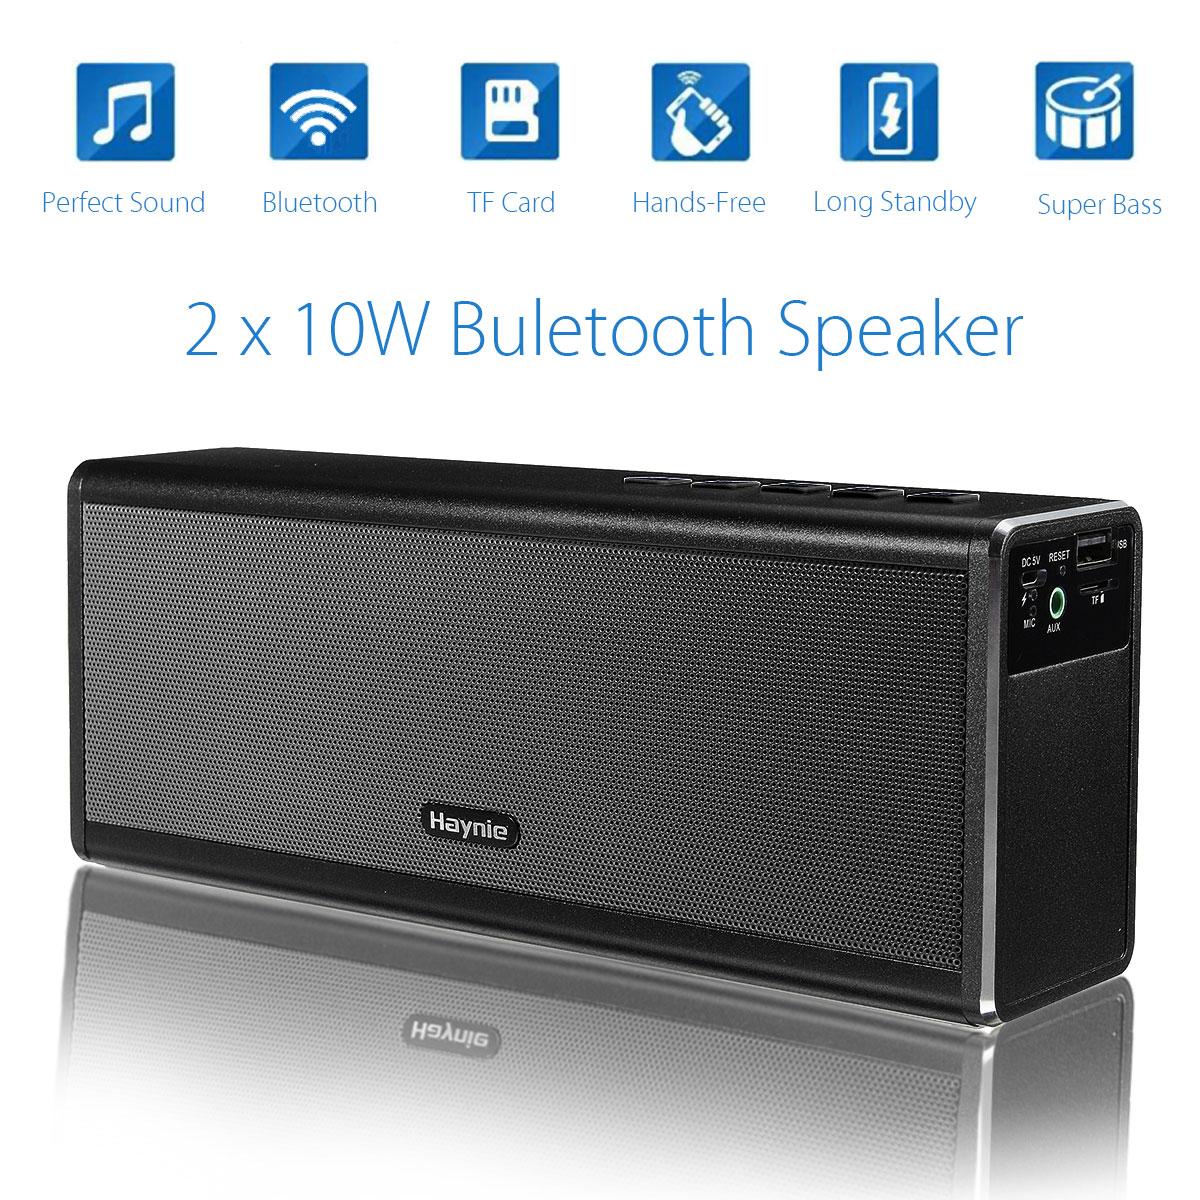 20W 4000Mah Portable HIFI Wireless Bluetooth 4.0 Speaker Stereo Super Bass Caixa Sound Box Handfree For Phone Power Bank